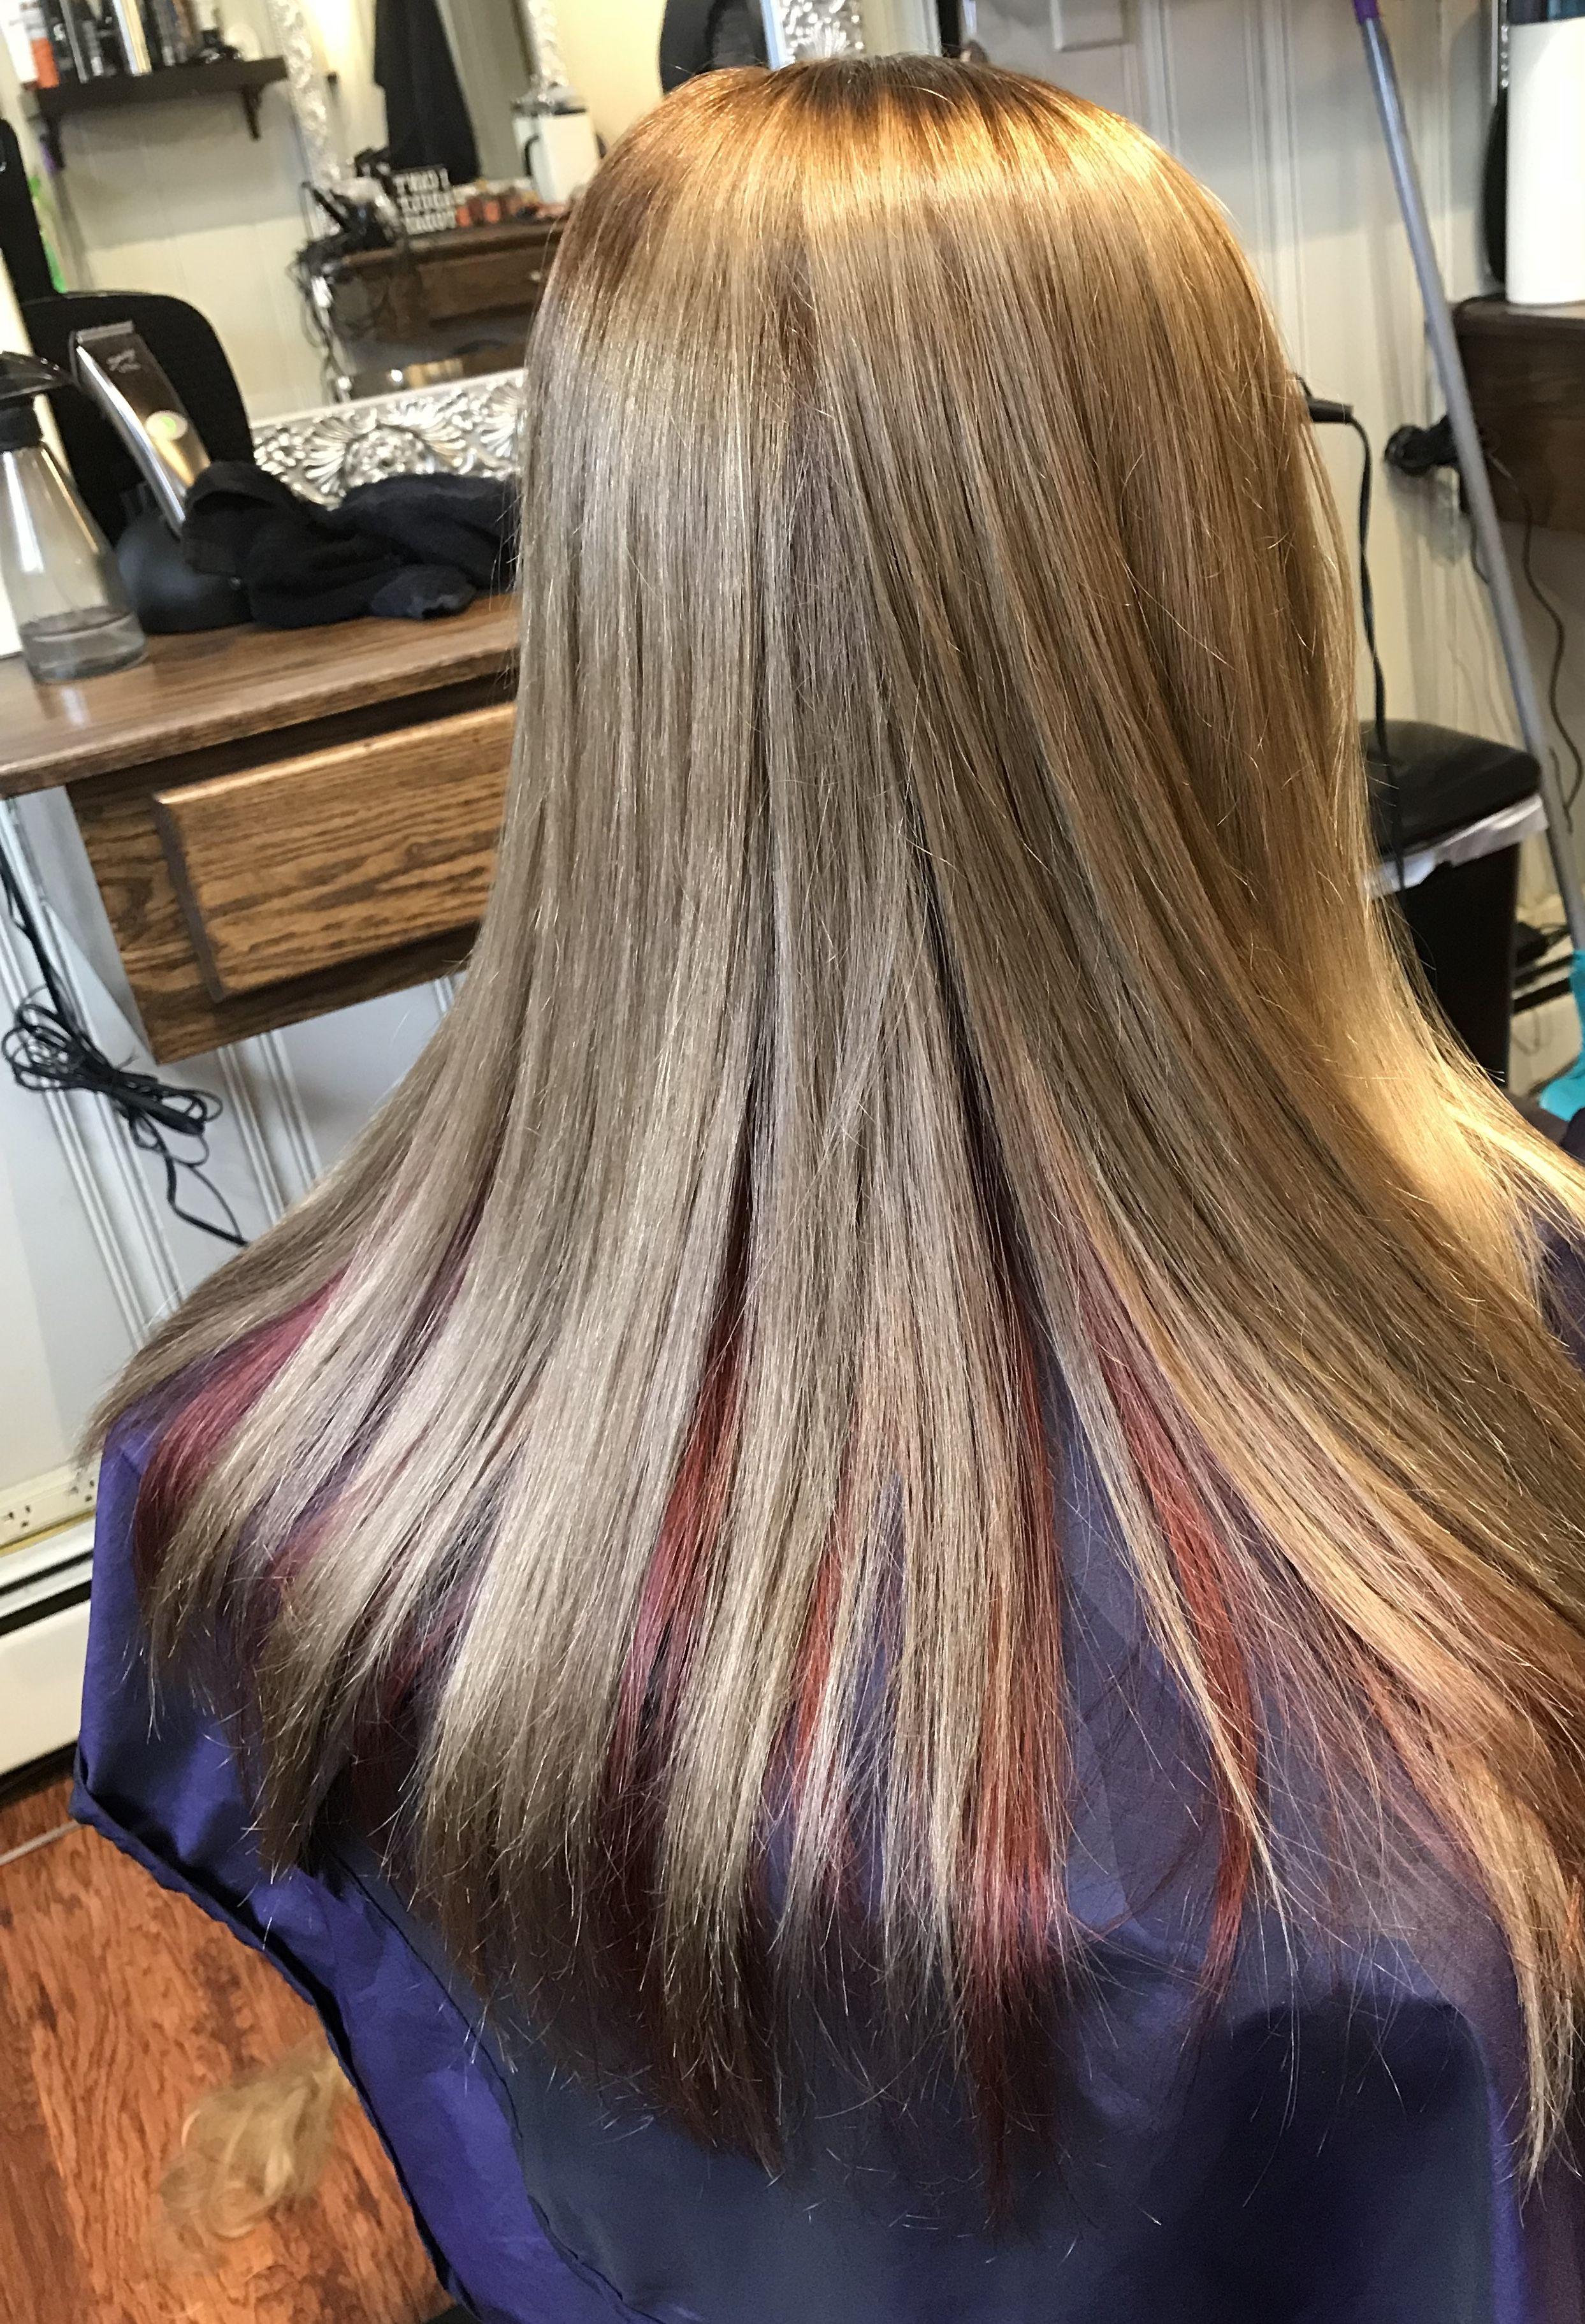 Dark Blonde Hair Color With Red Color Underneath Dark Blonde